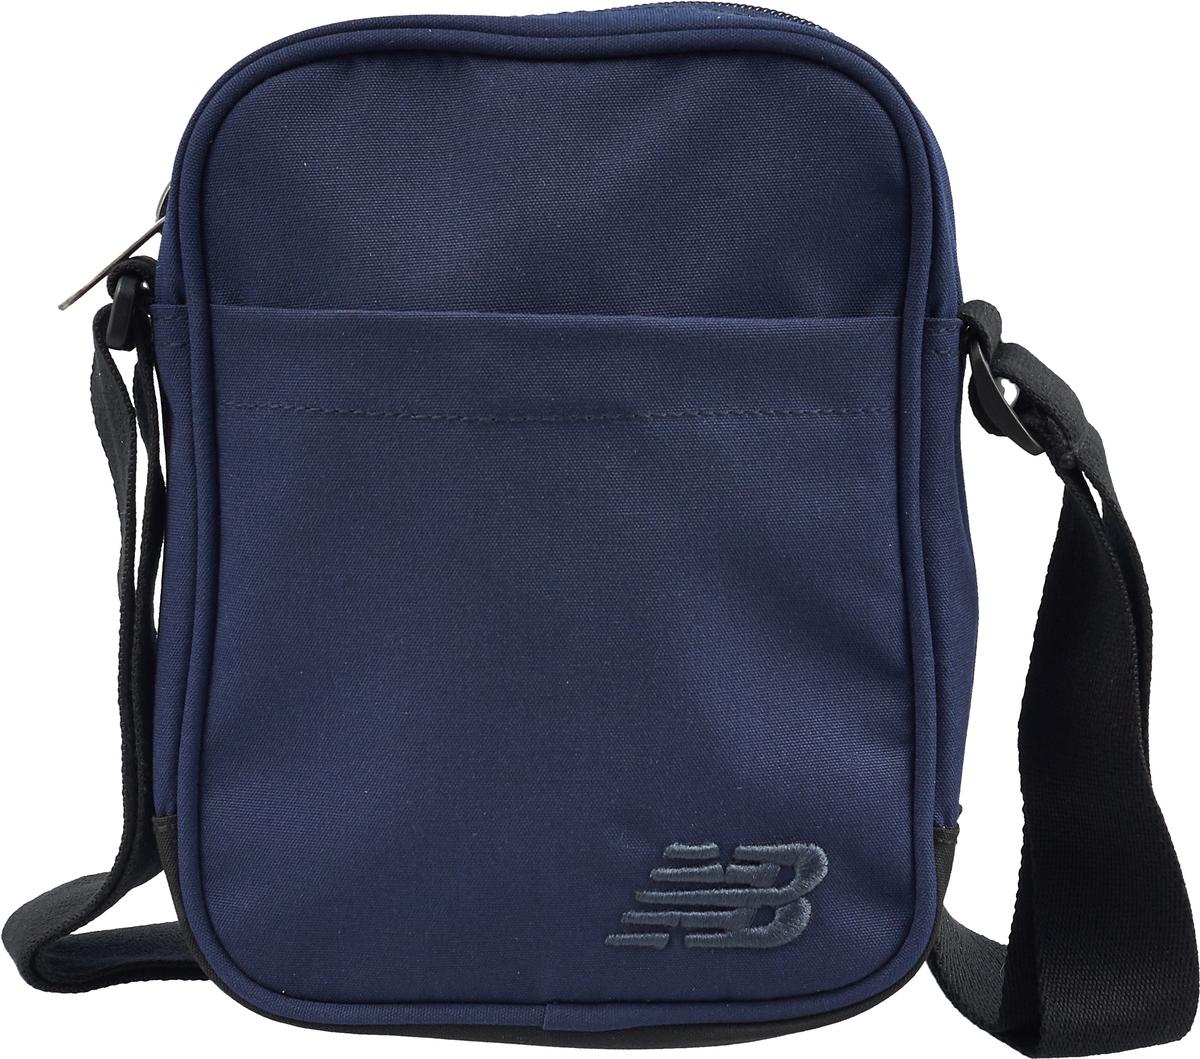 Сумка на плечо мужская New Balance, цвет: темно-синий. 500280/420